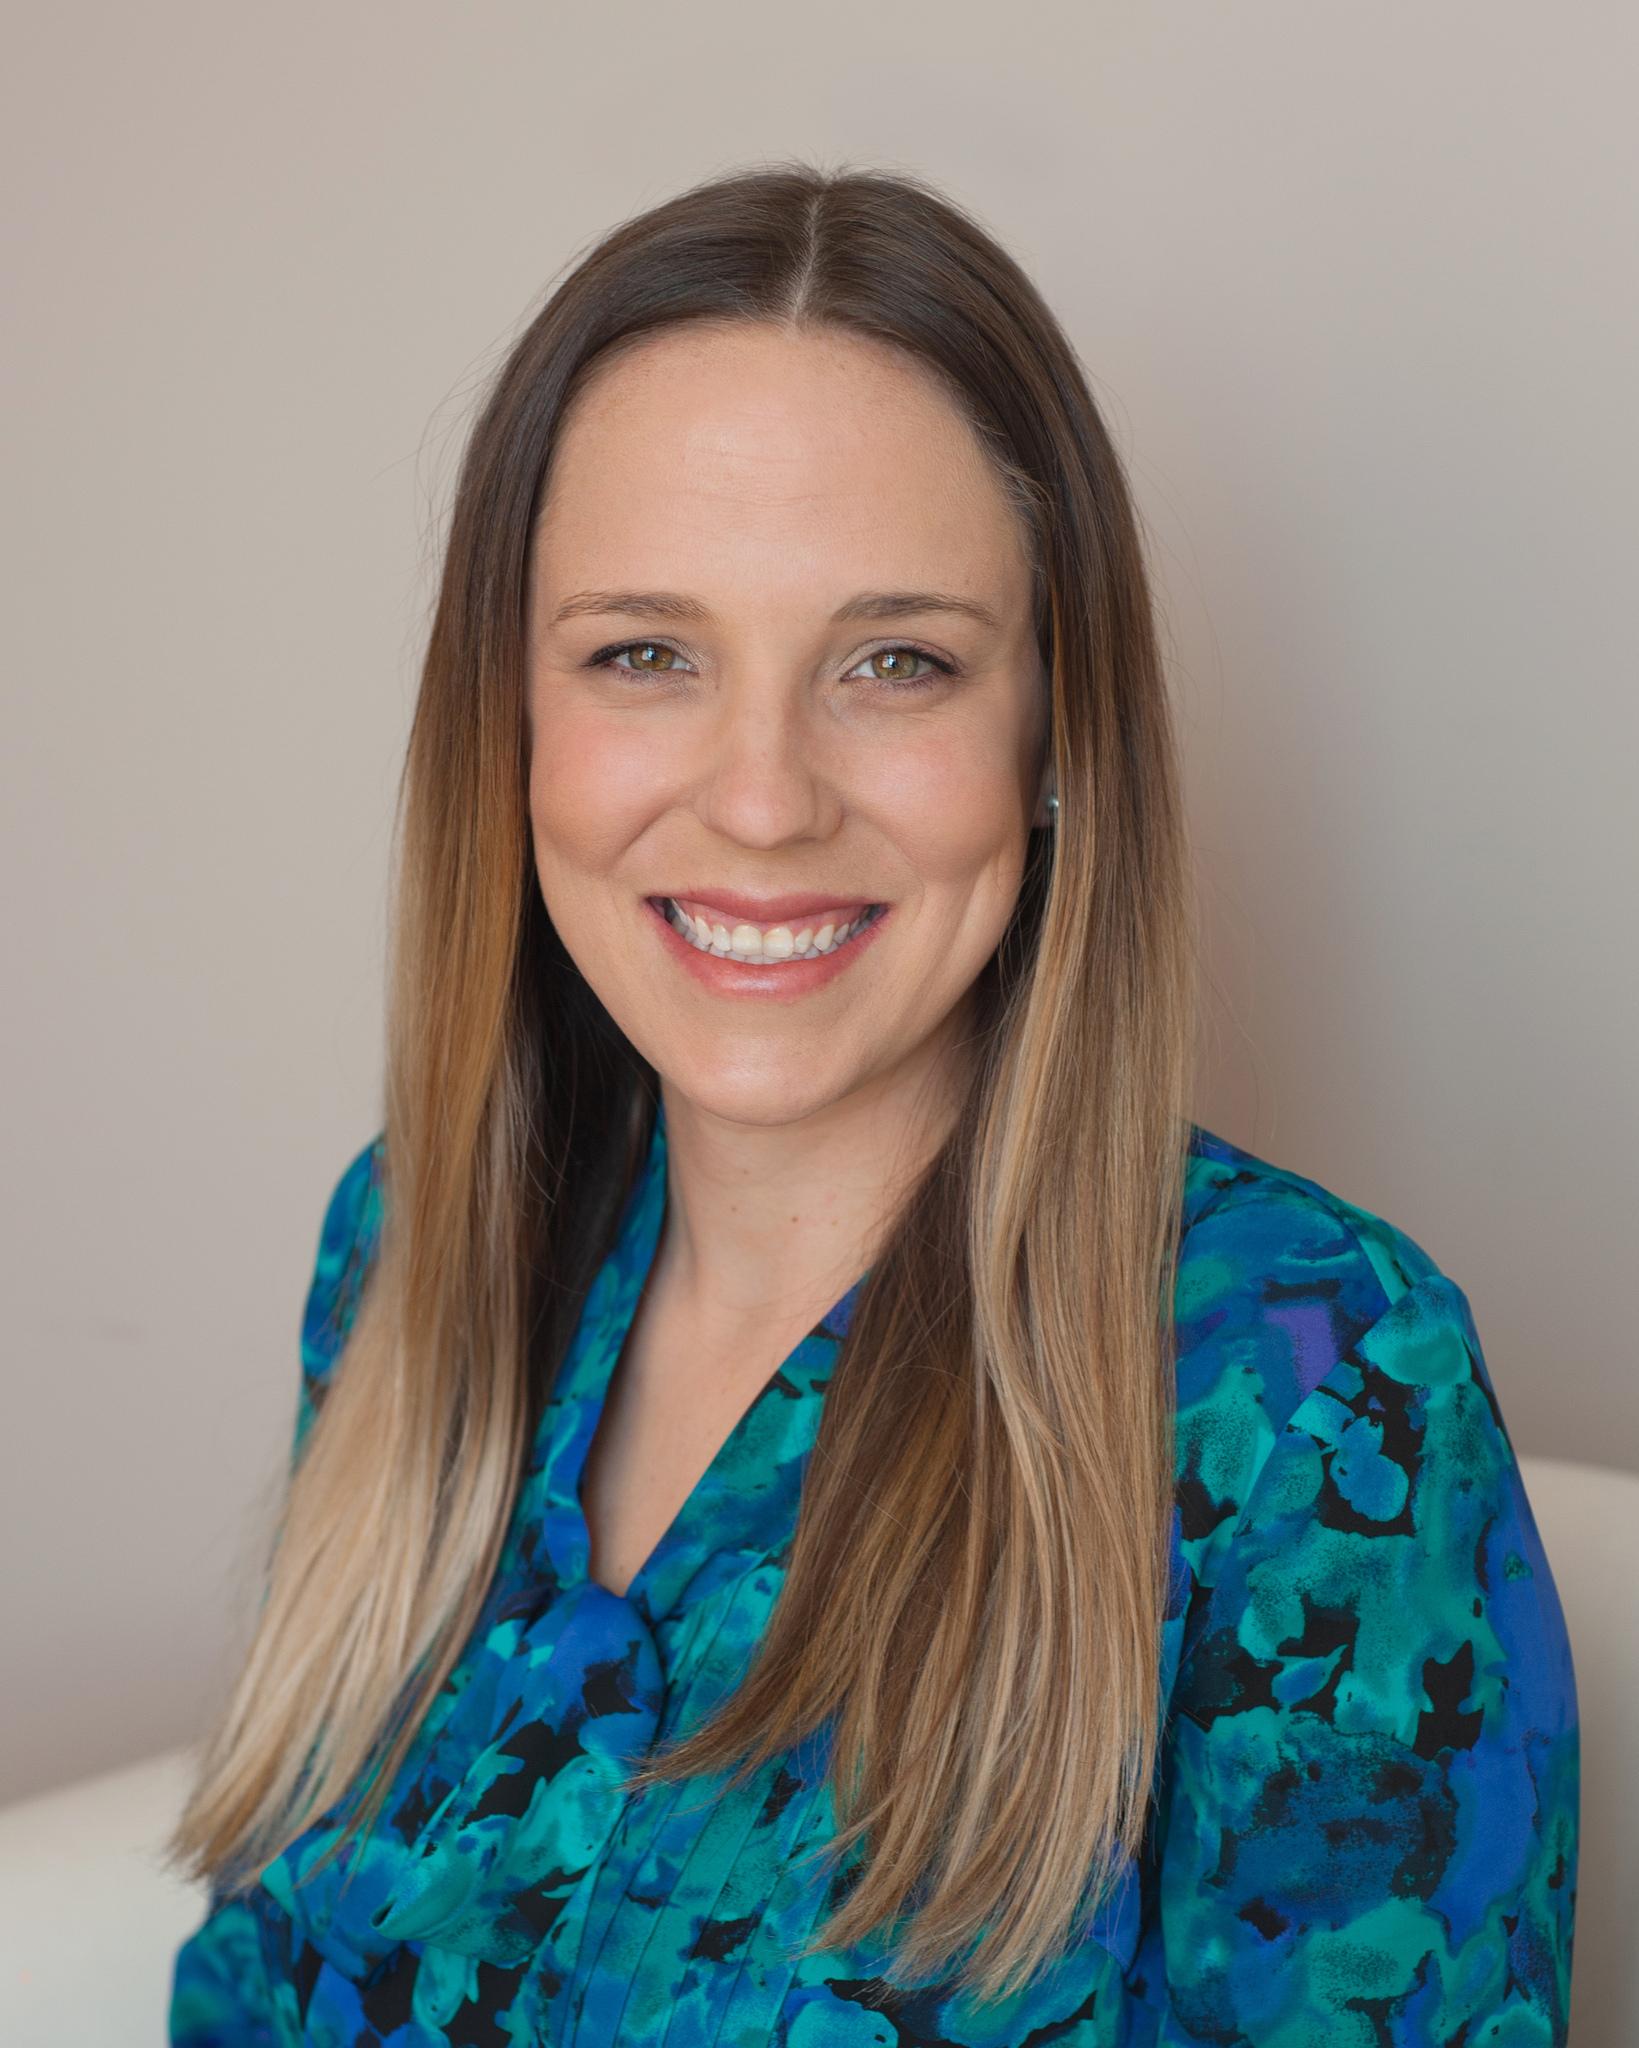 Laura Crane MFT The Center for Connection Healing and Change Woodbridge VA